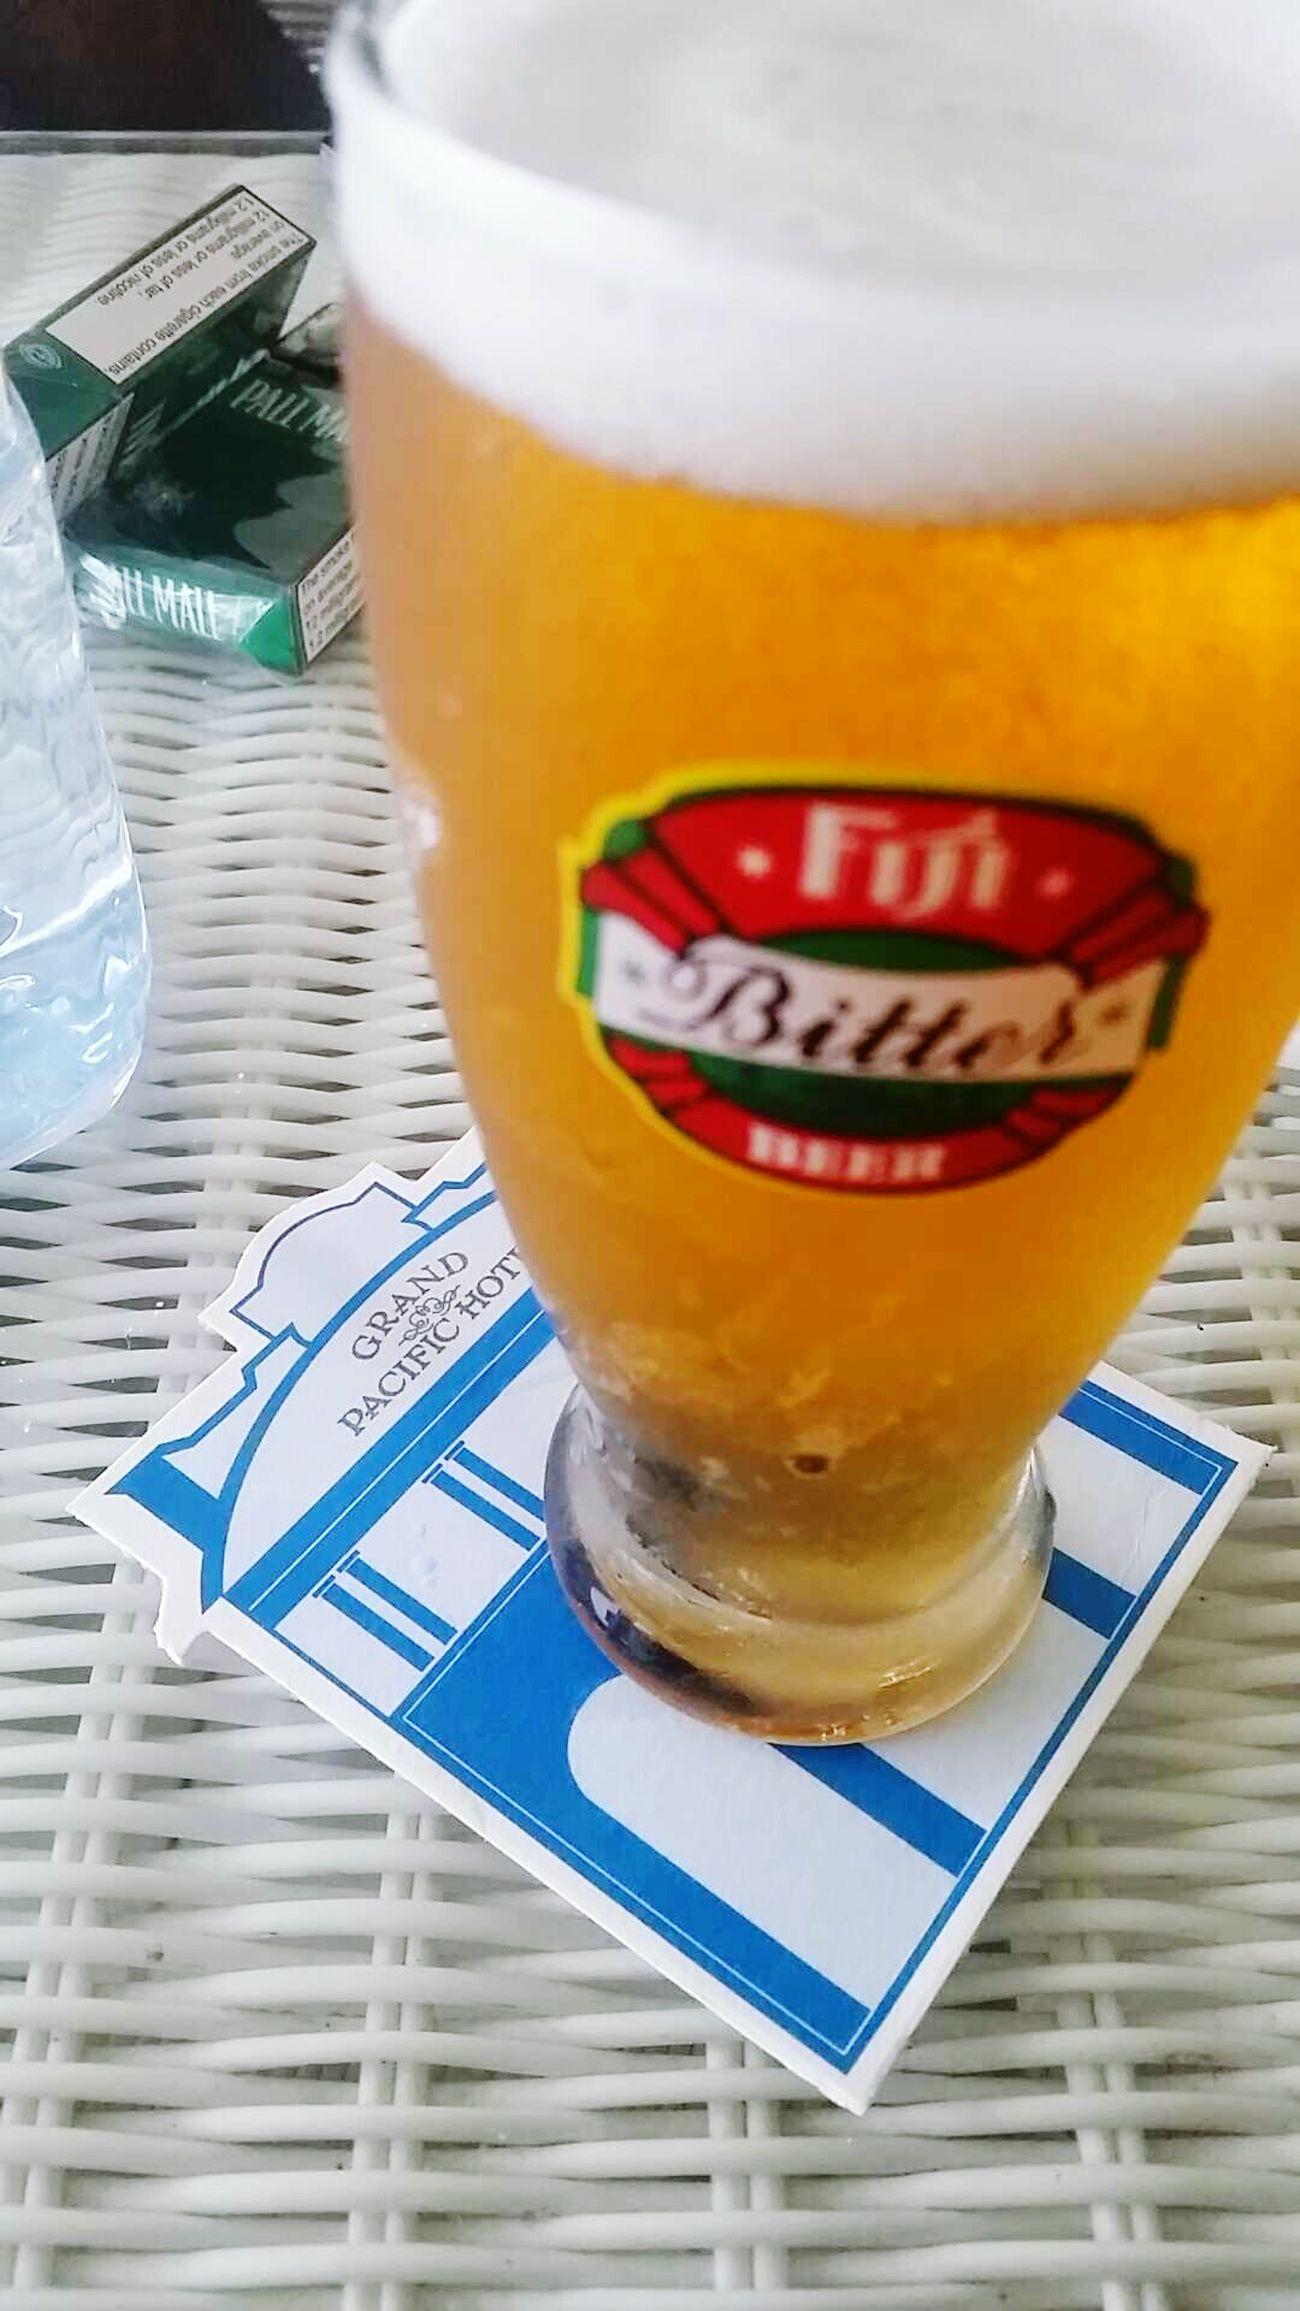 FijiBitter Beer GPH GrandPacificHotel Grandoldlady Relaxing